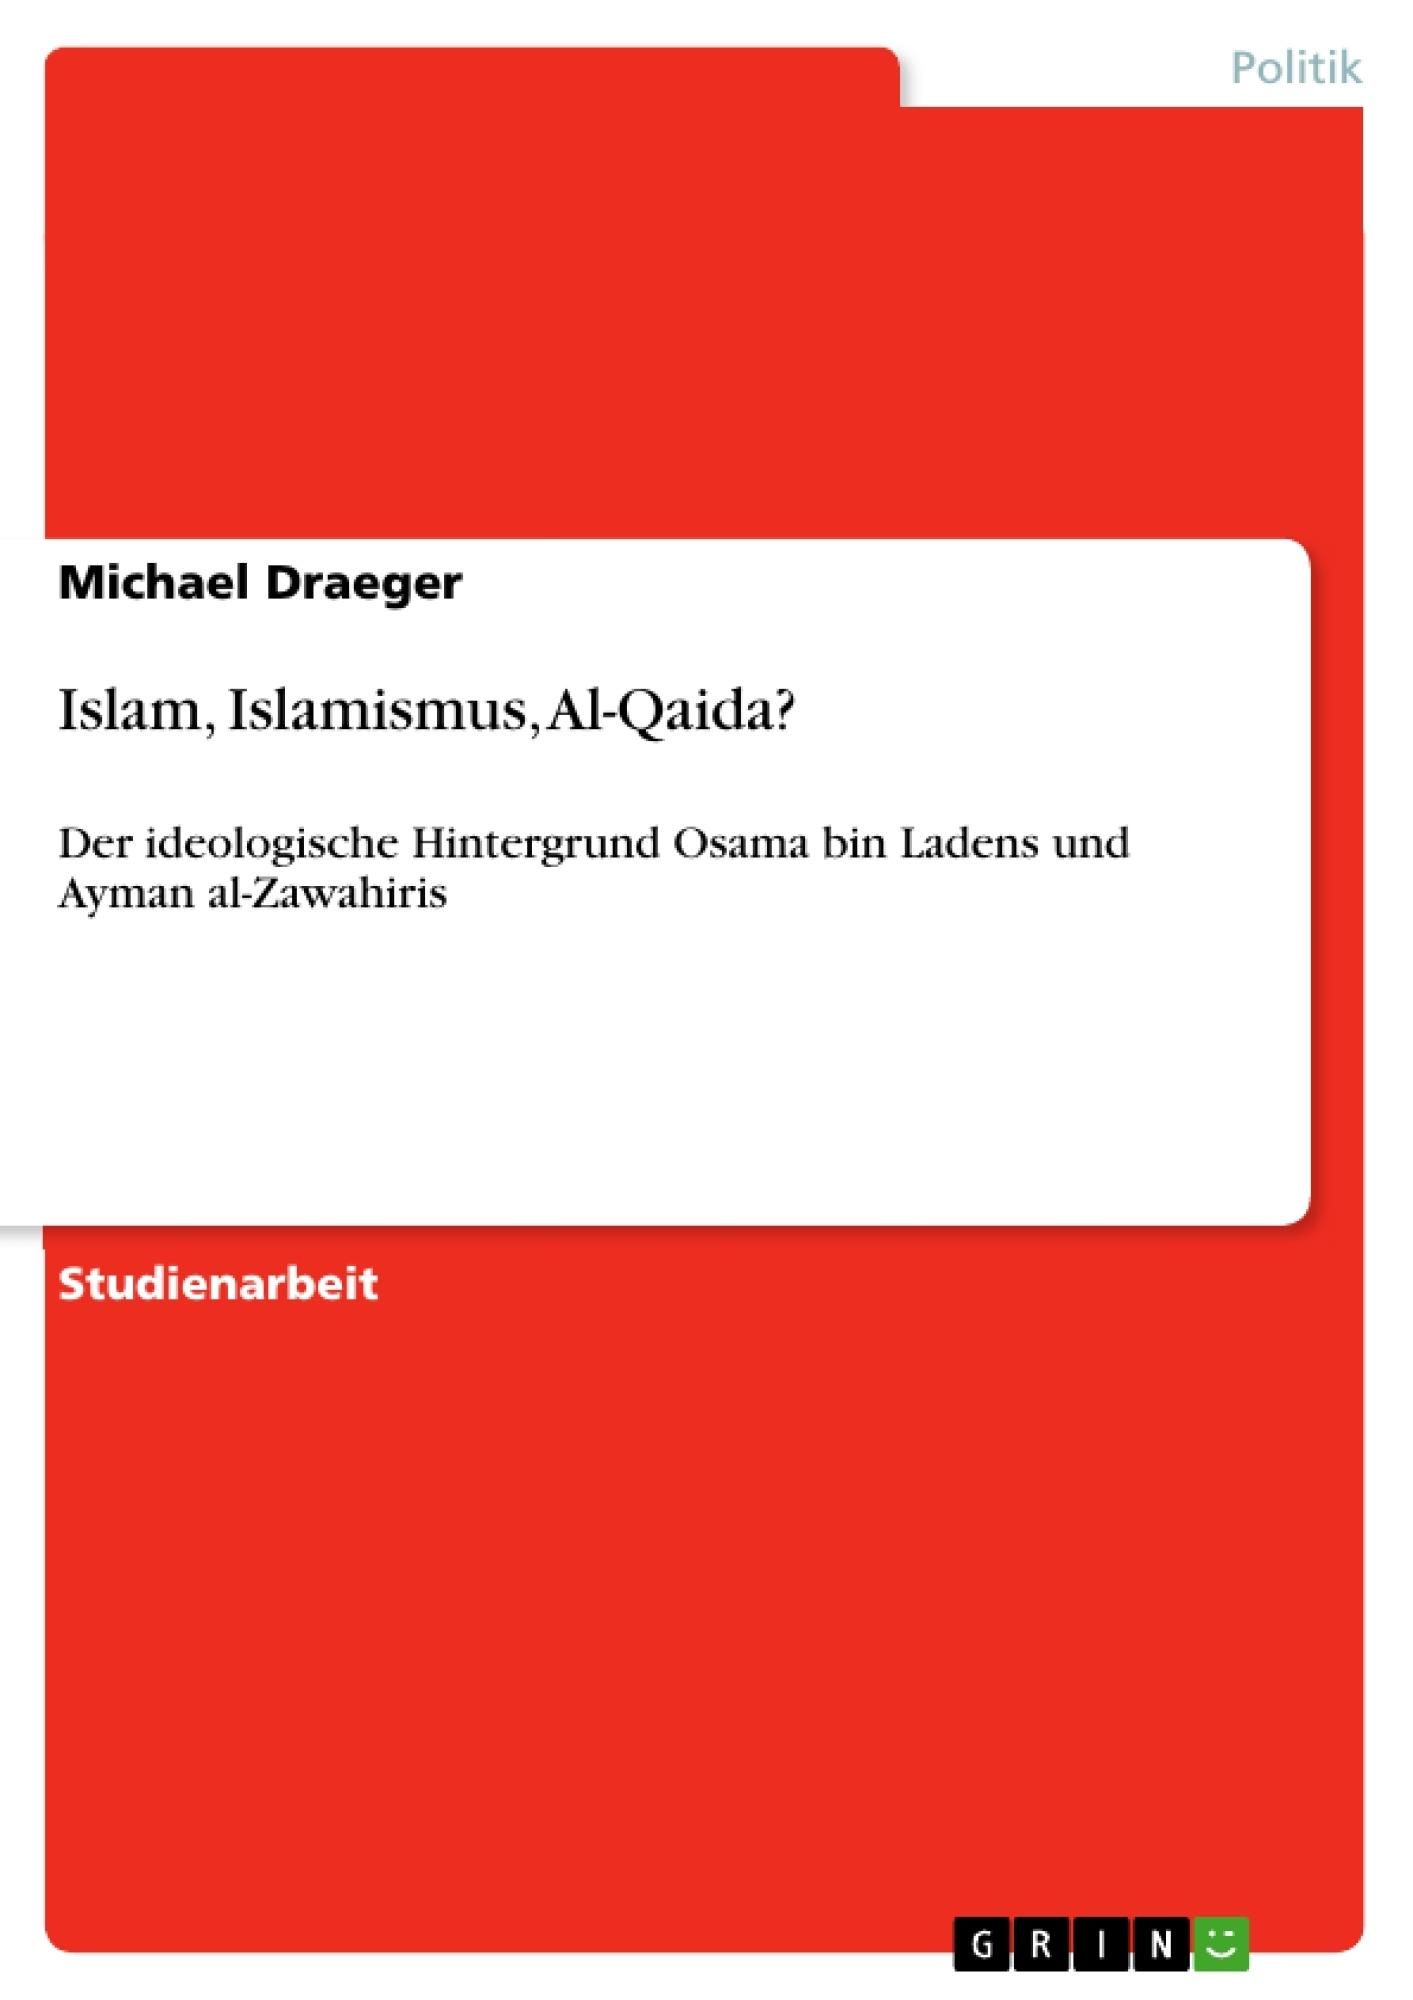 Titel: Islam, Islamismus, Al-Qaida?